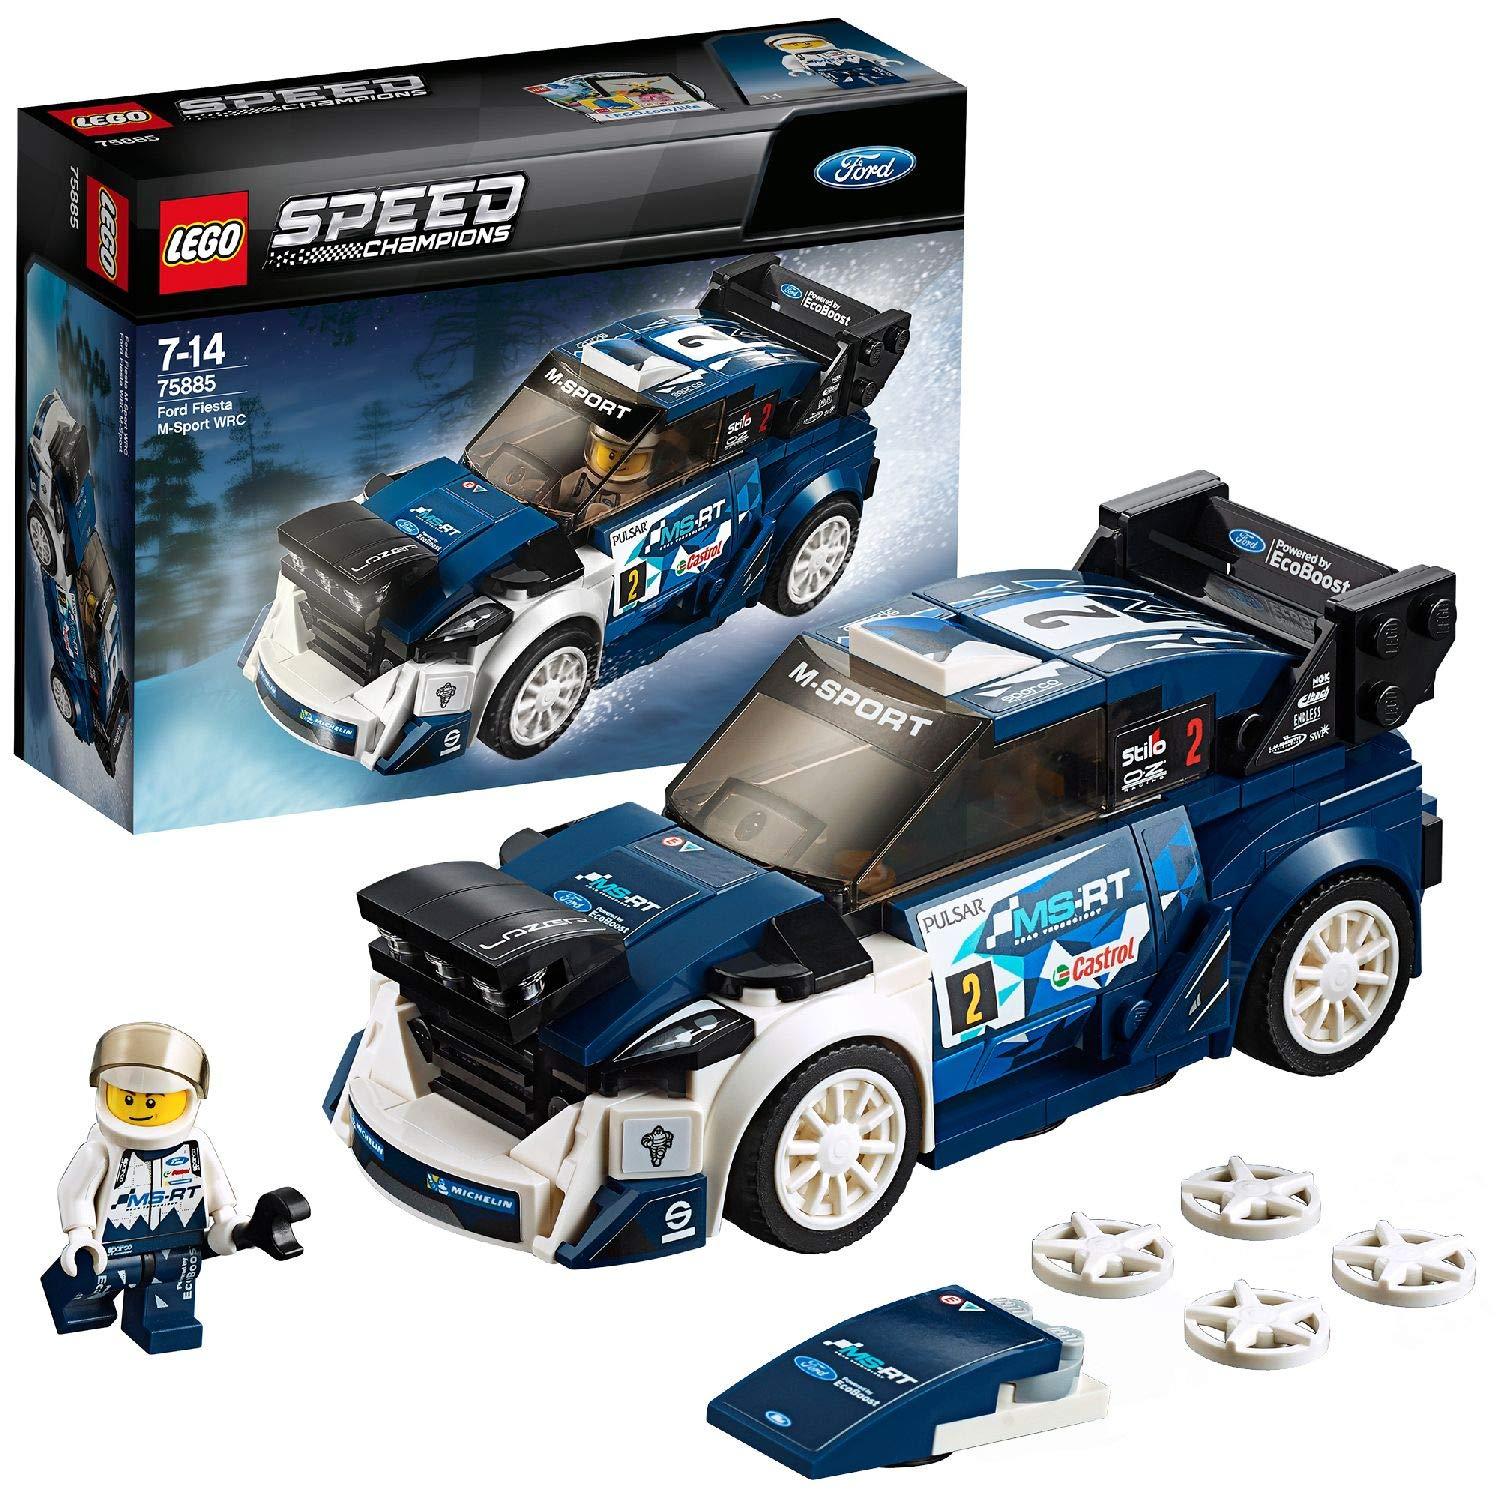 Lego Speed Champions 75885 - Ford Fiesta WRC M-Sport